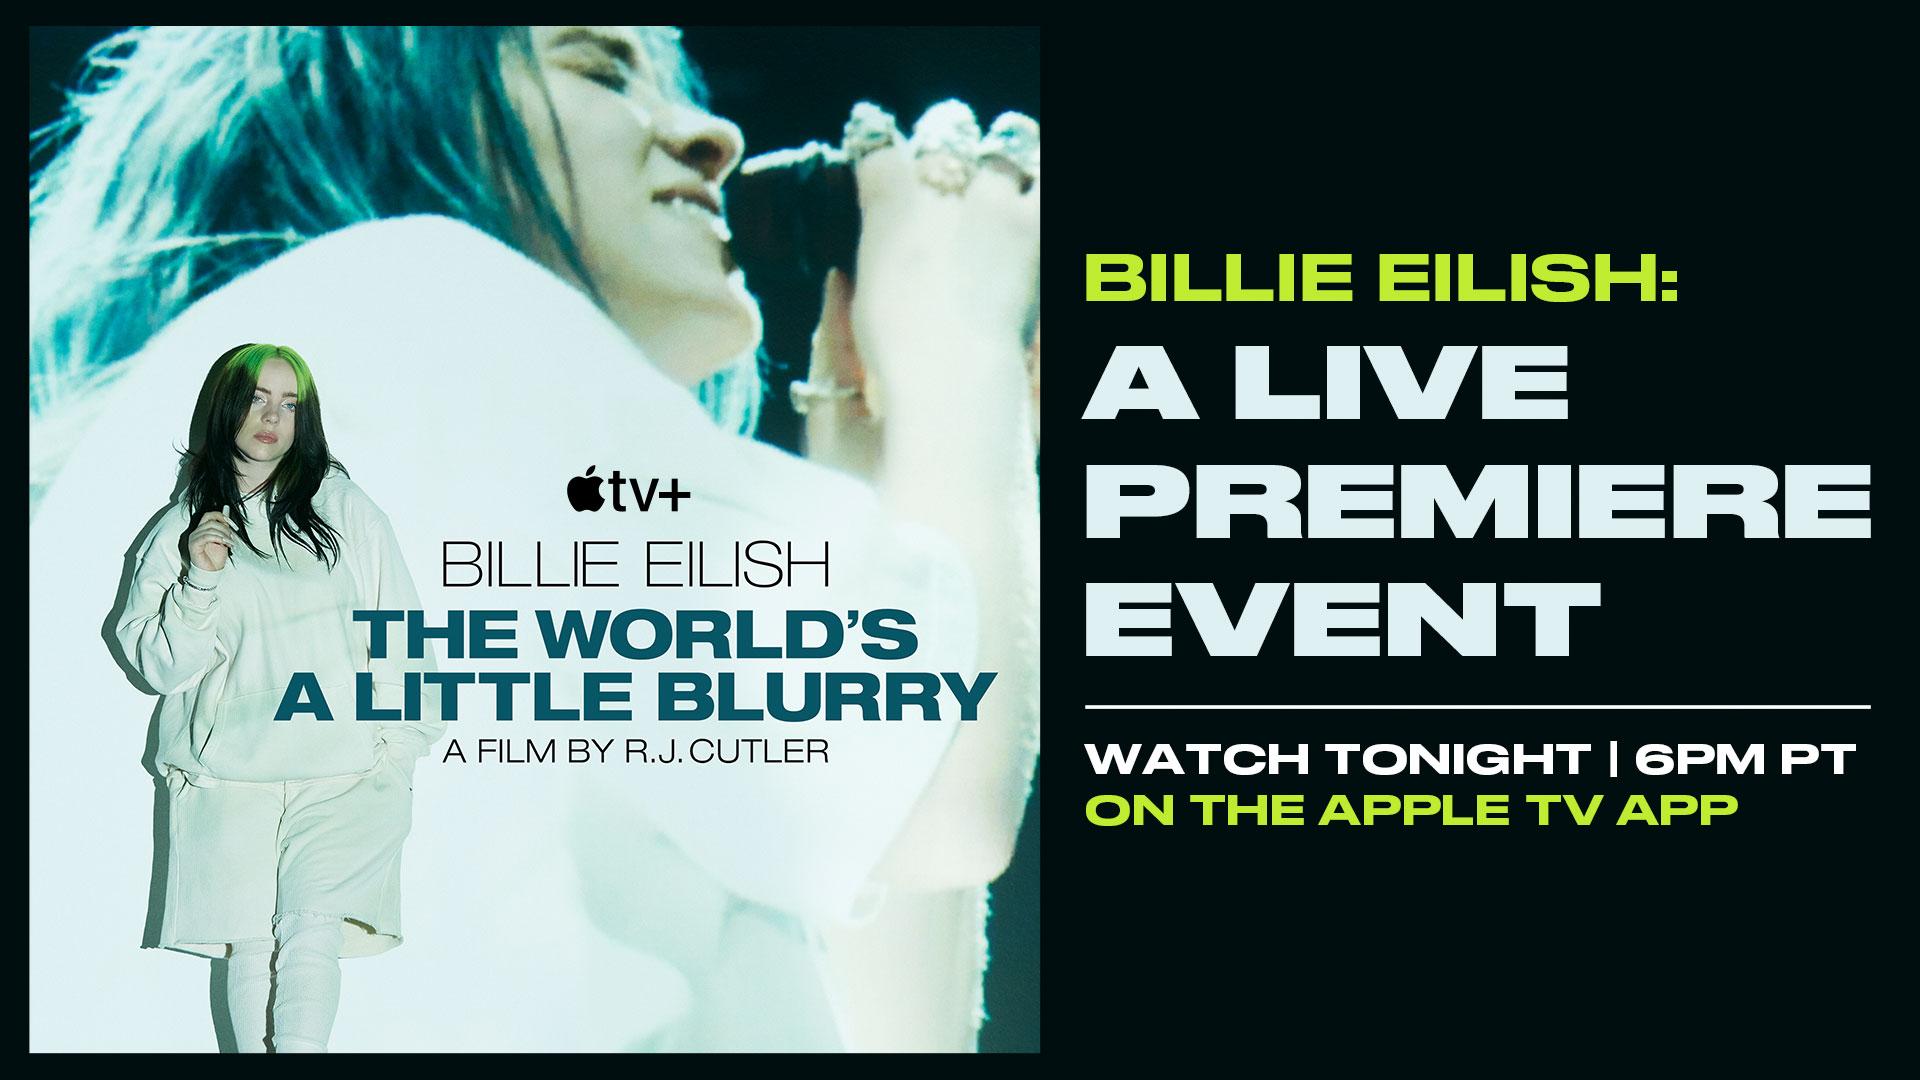 https://www.billieforum.com/media/blurry_premiere_event-jpg.4589/full